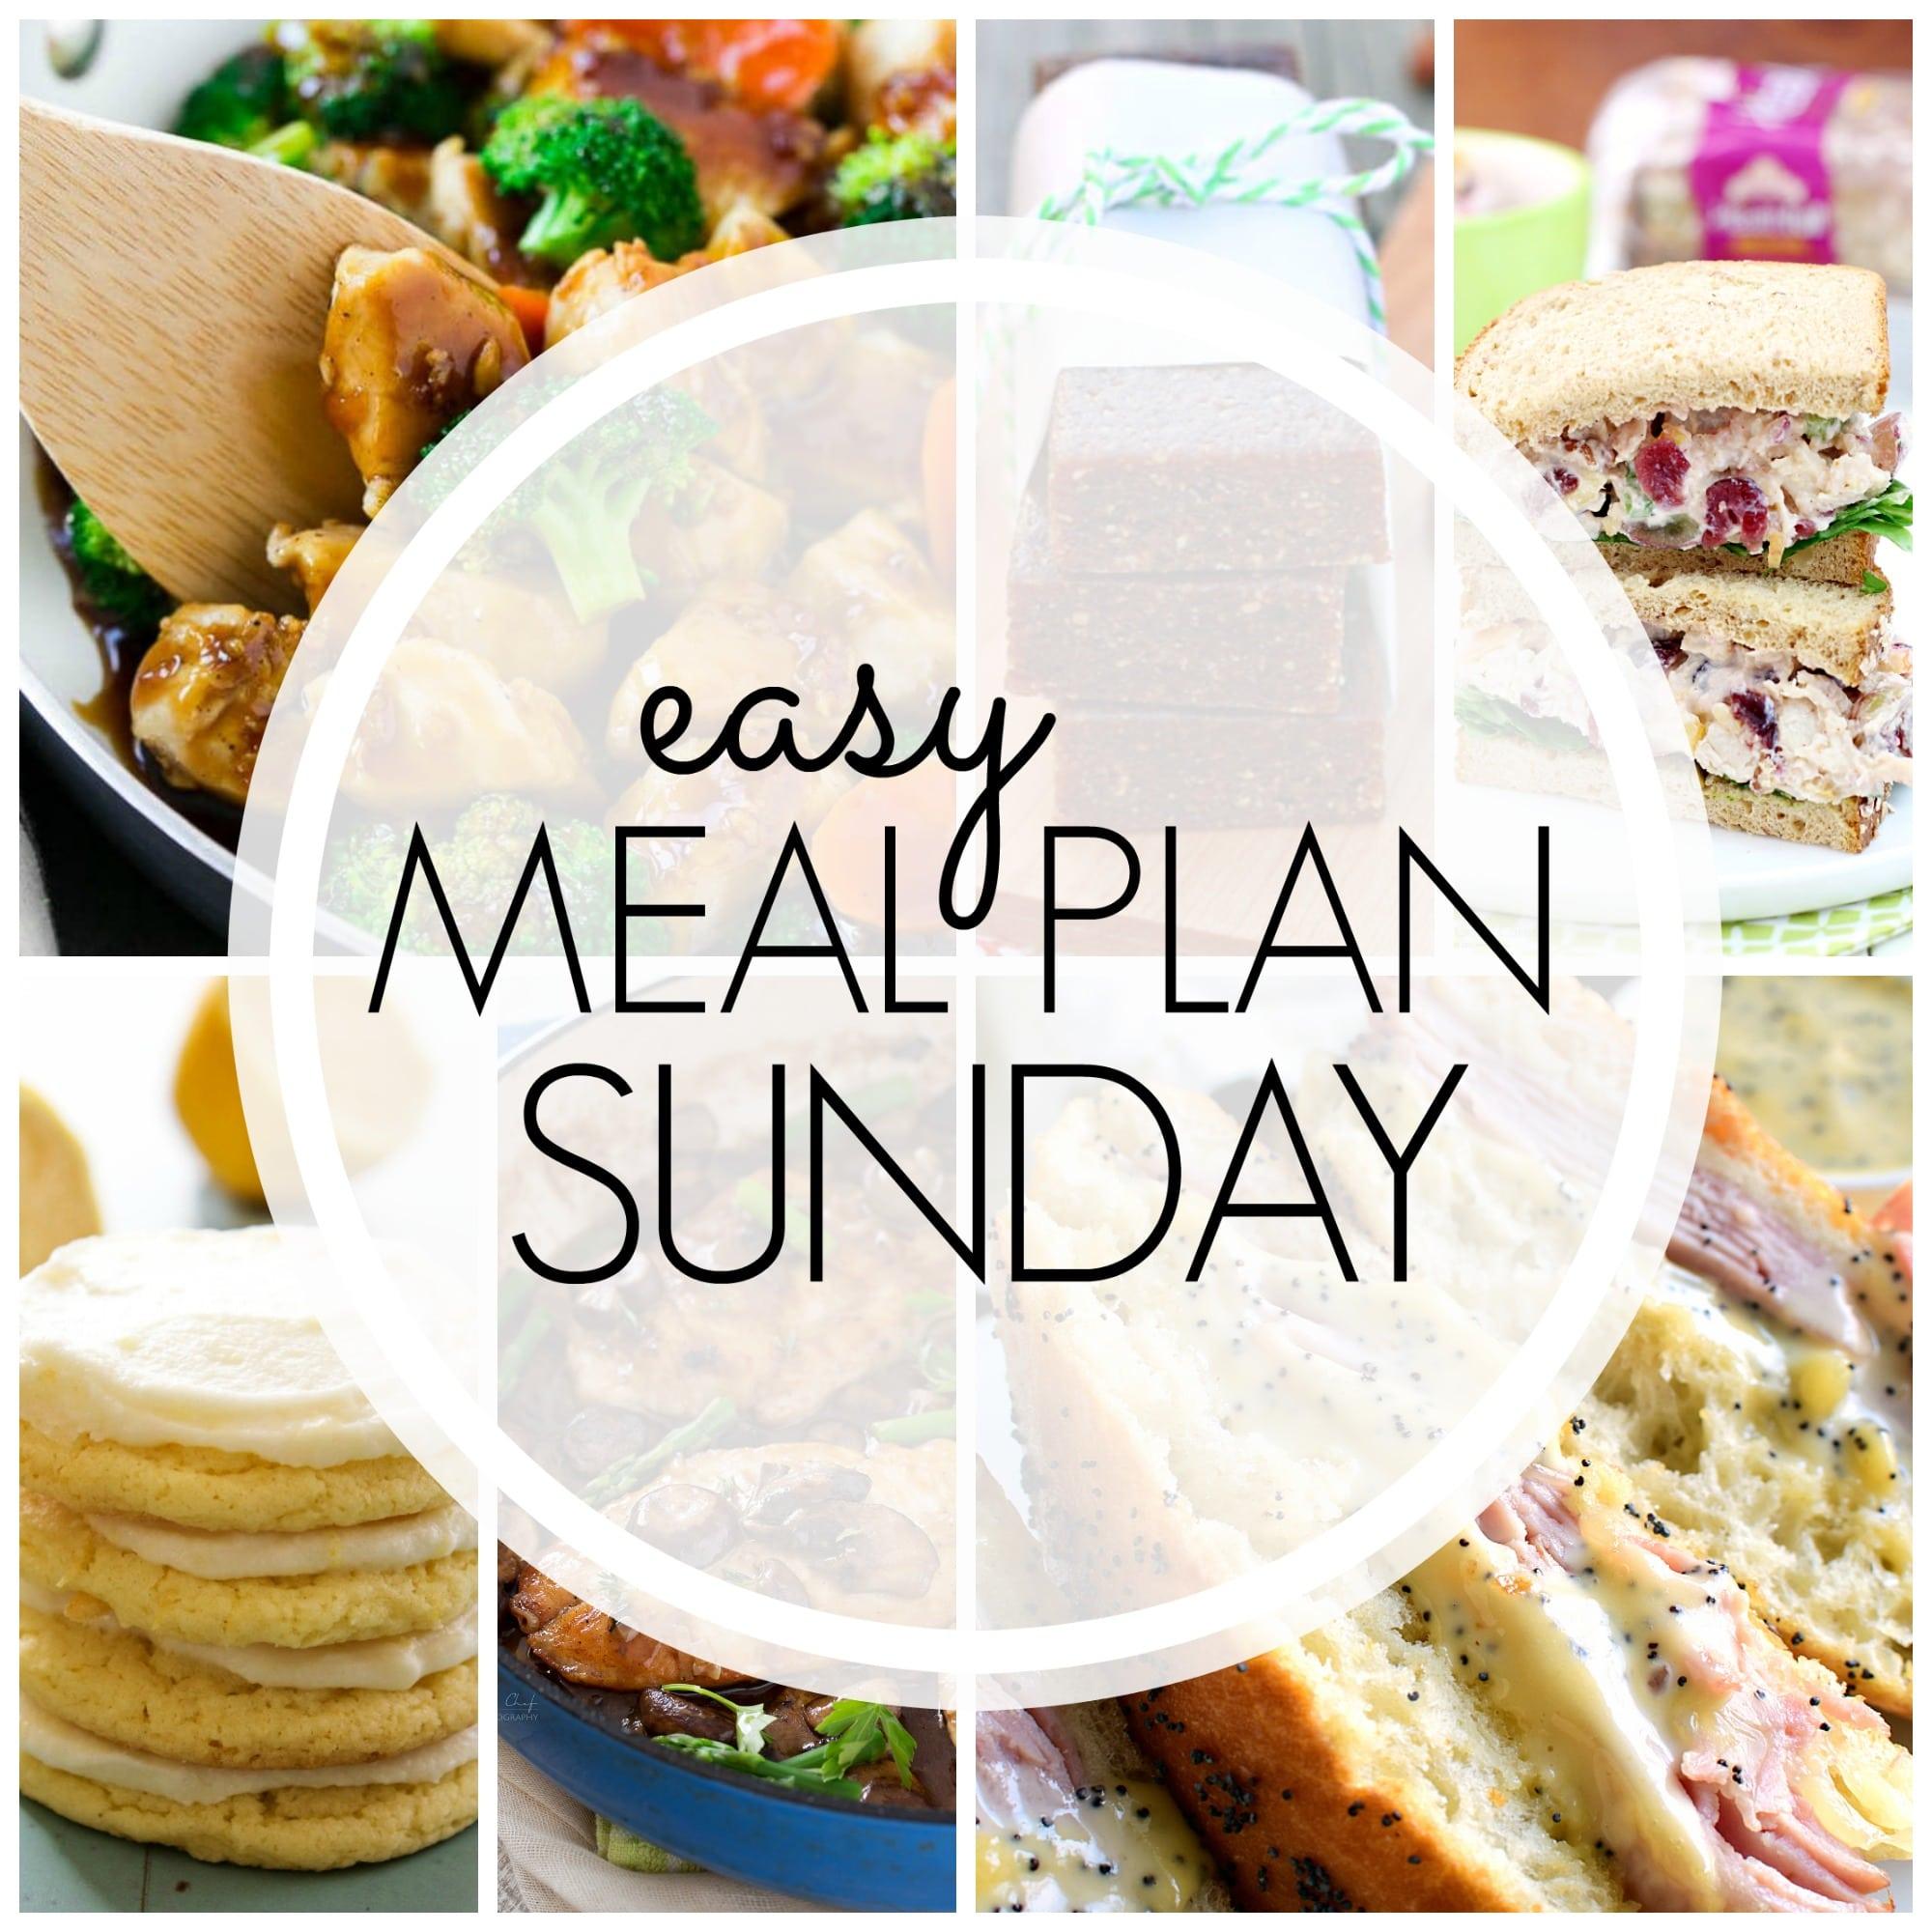 Easy Meal Plan Sunday - Week 91